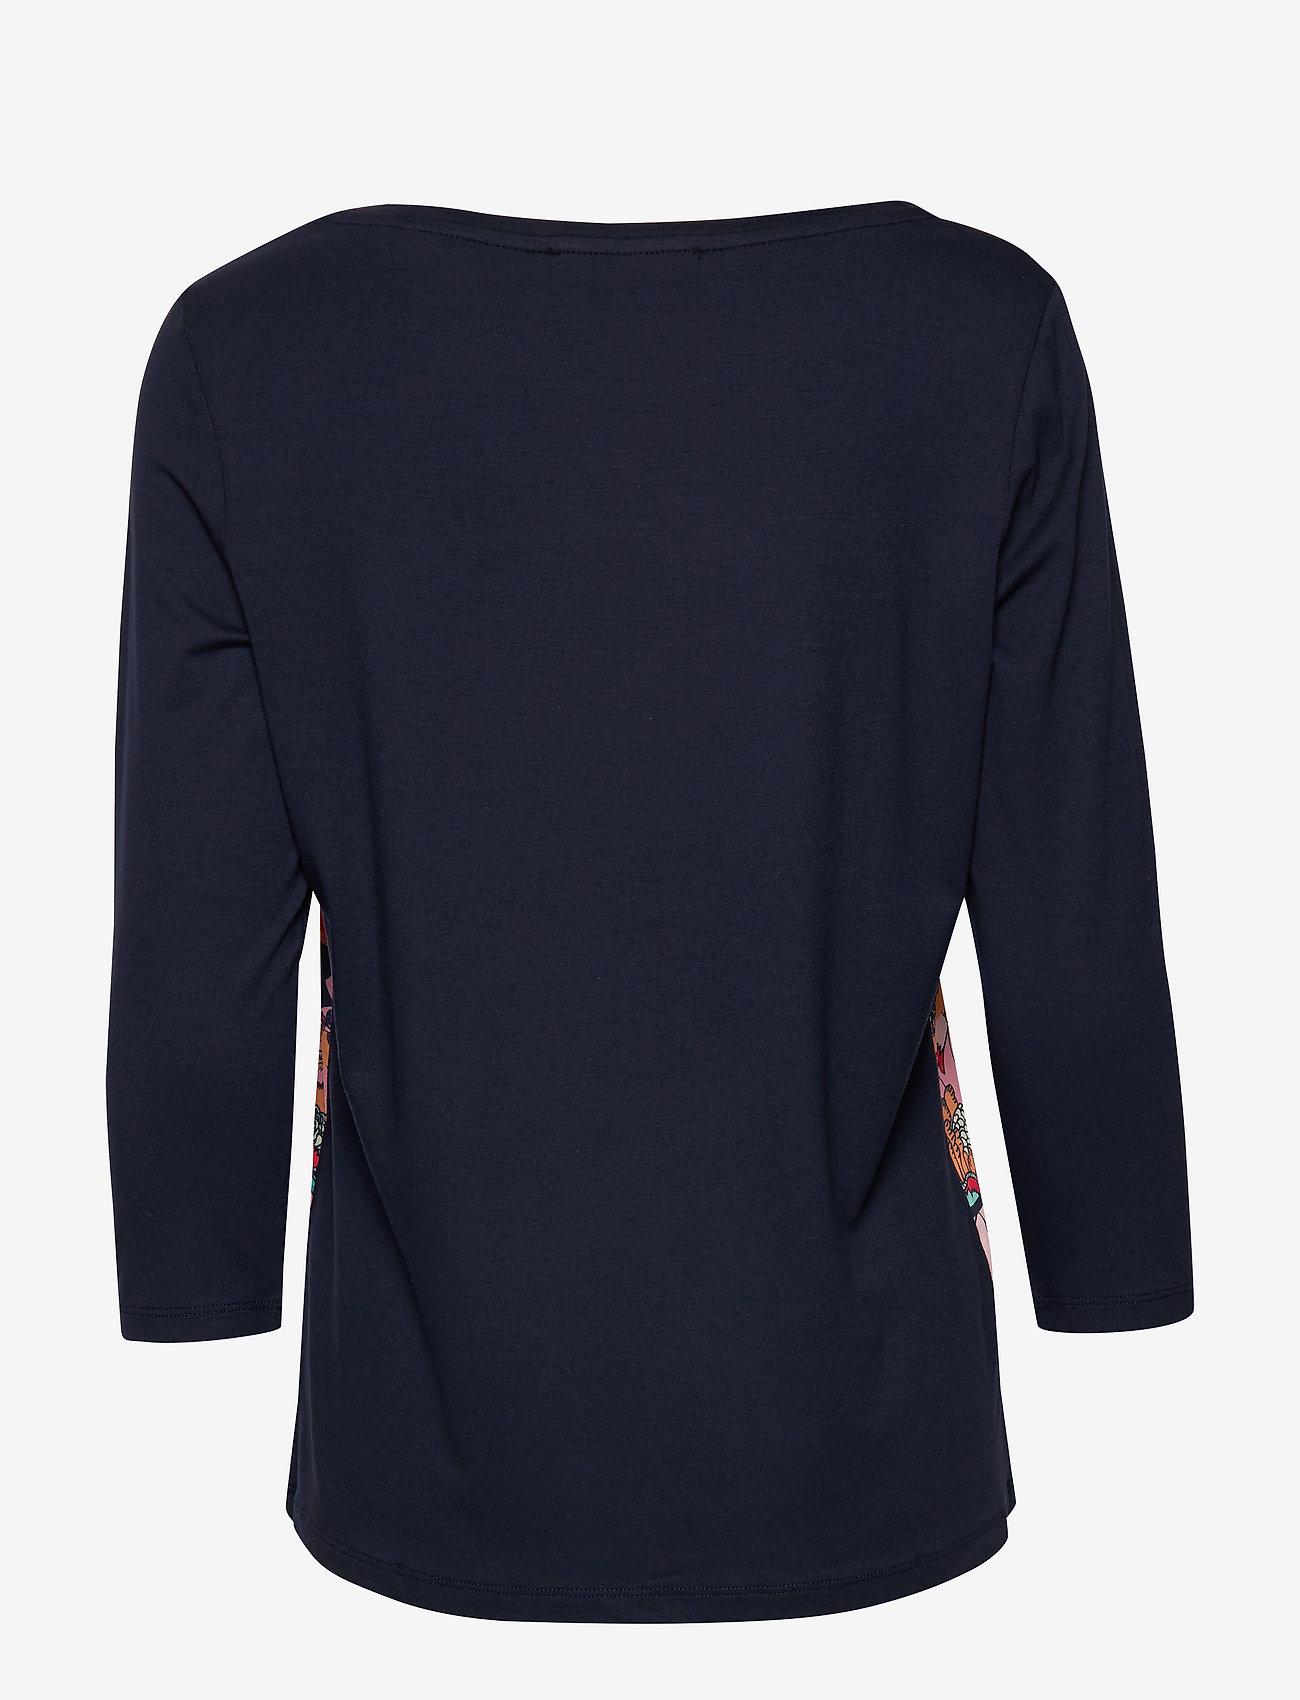 Shirt Short 3/4 Sleeve (Dark Blue/red) - Betty Barclay 3nAmcg